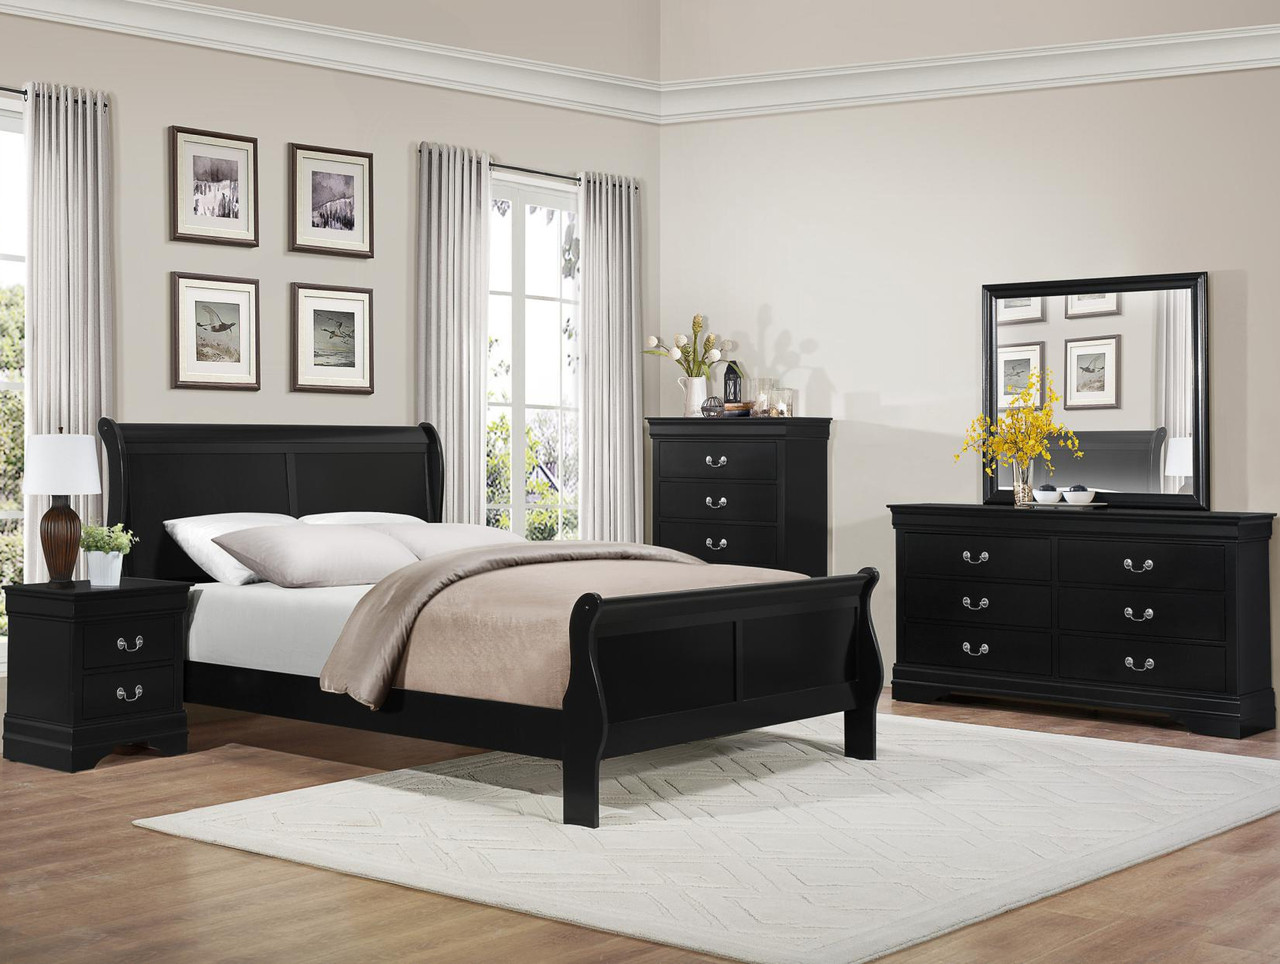 Jed Black Sleigh Bedroom Set - CB Furniture